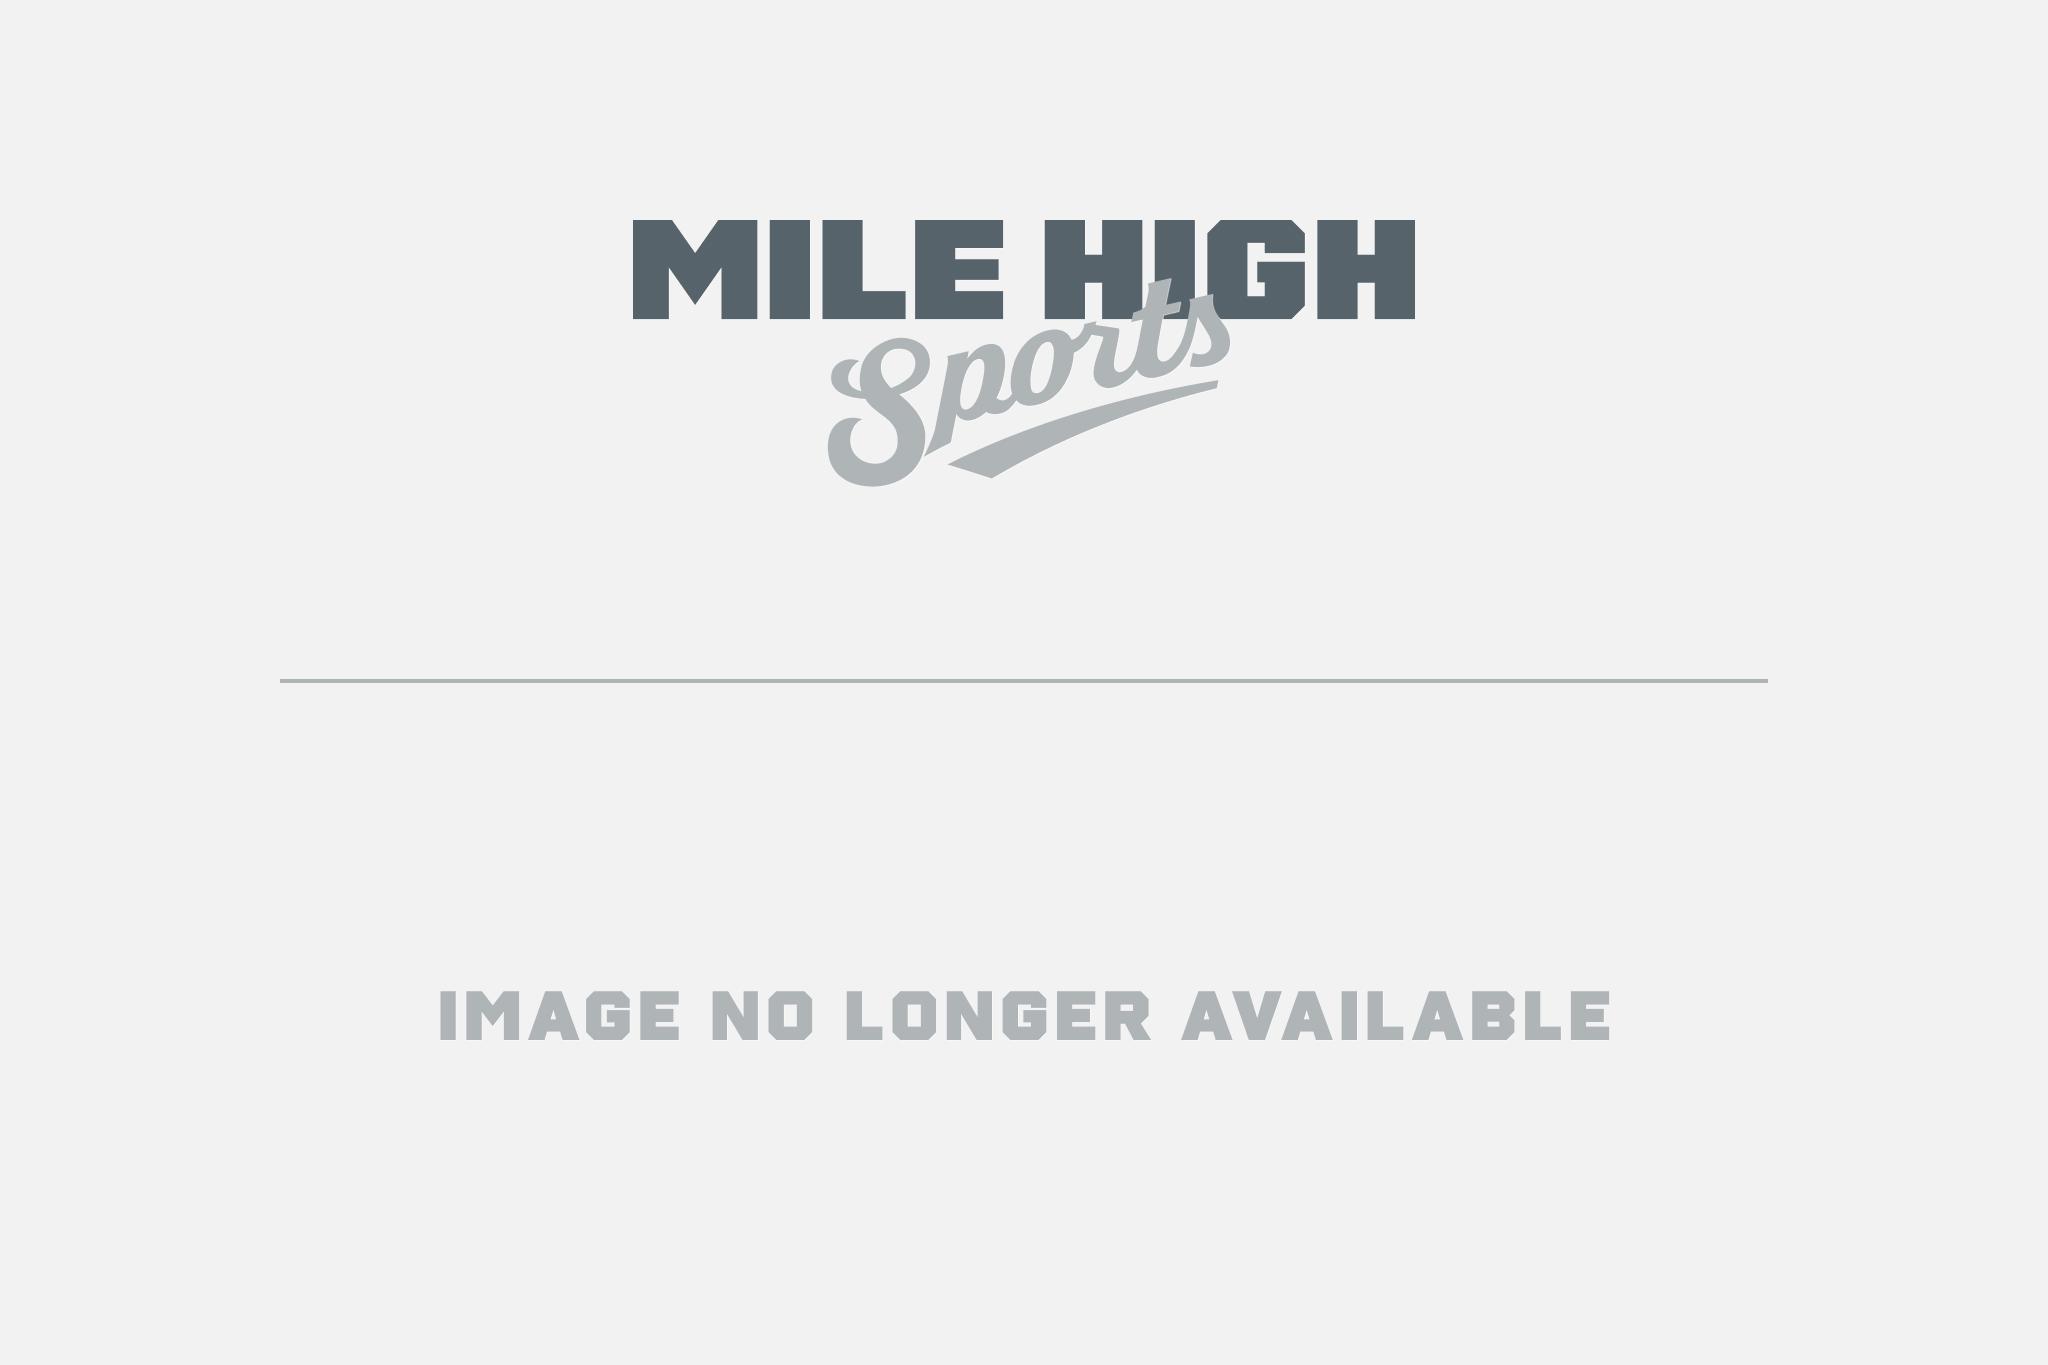 Giants' Bumgarner hurts shoulder, ribs in dirt bike accident